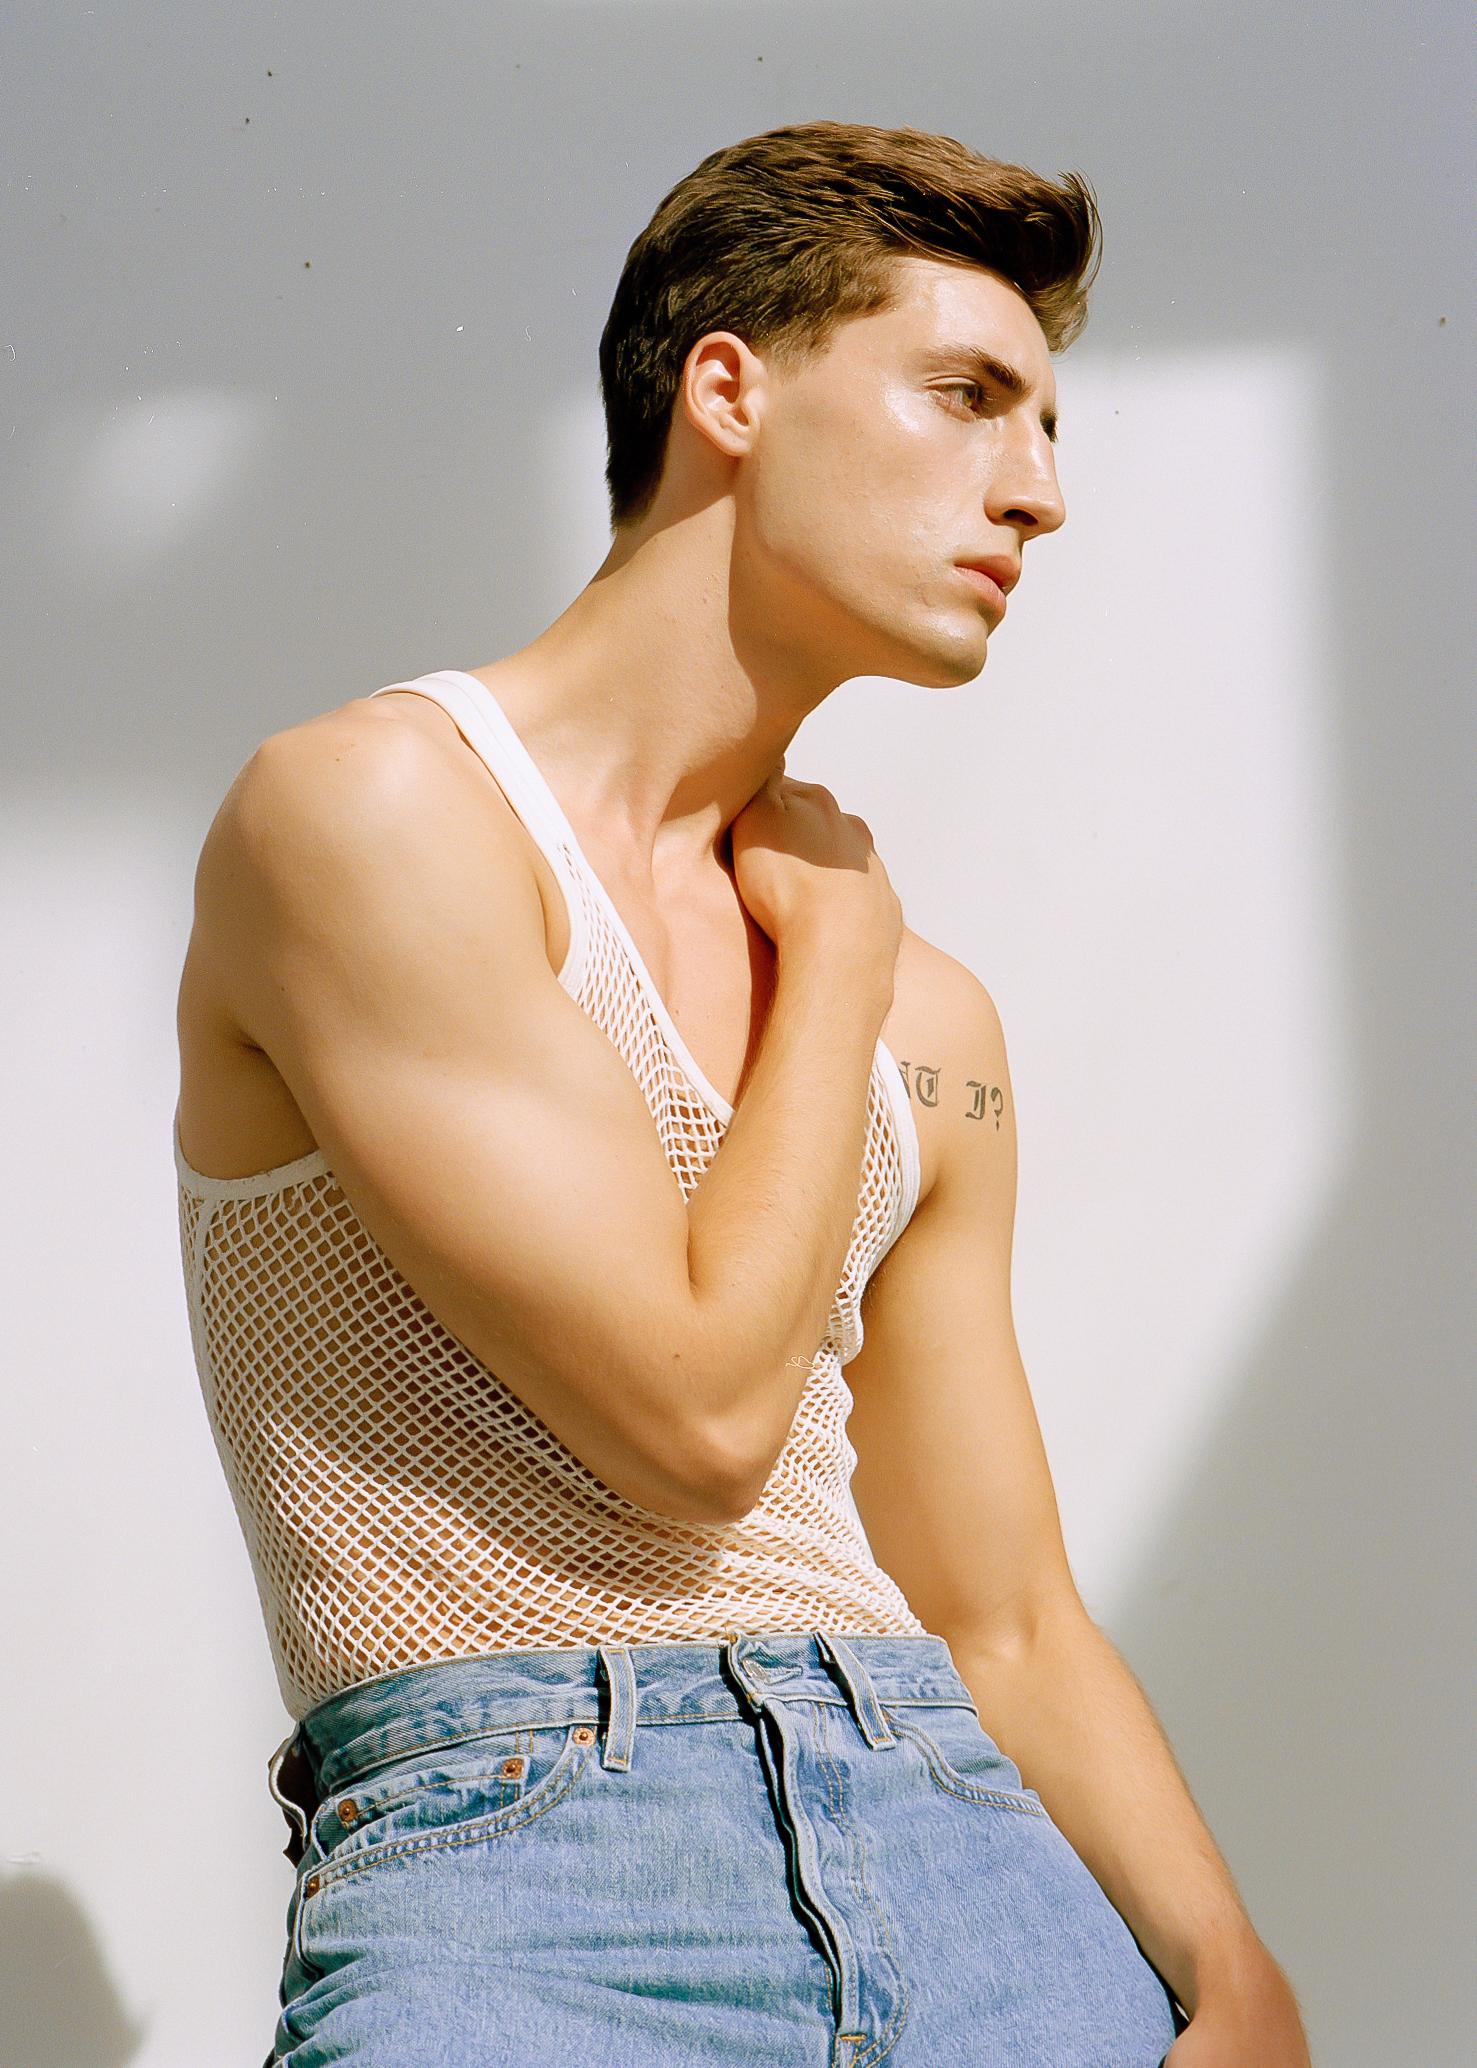 Photographer: Rydel Cerezo  Model: Aidan Correia of Richards Models  Styling: Gemini Rising Vintage